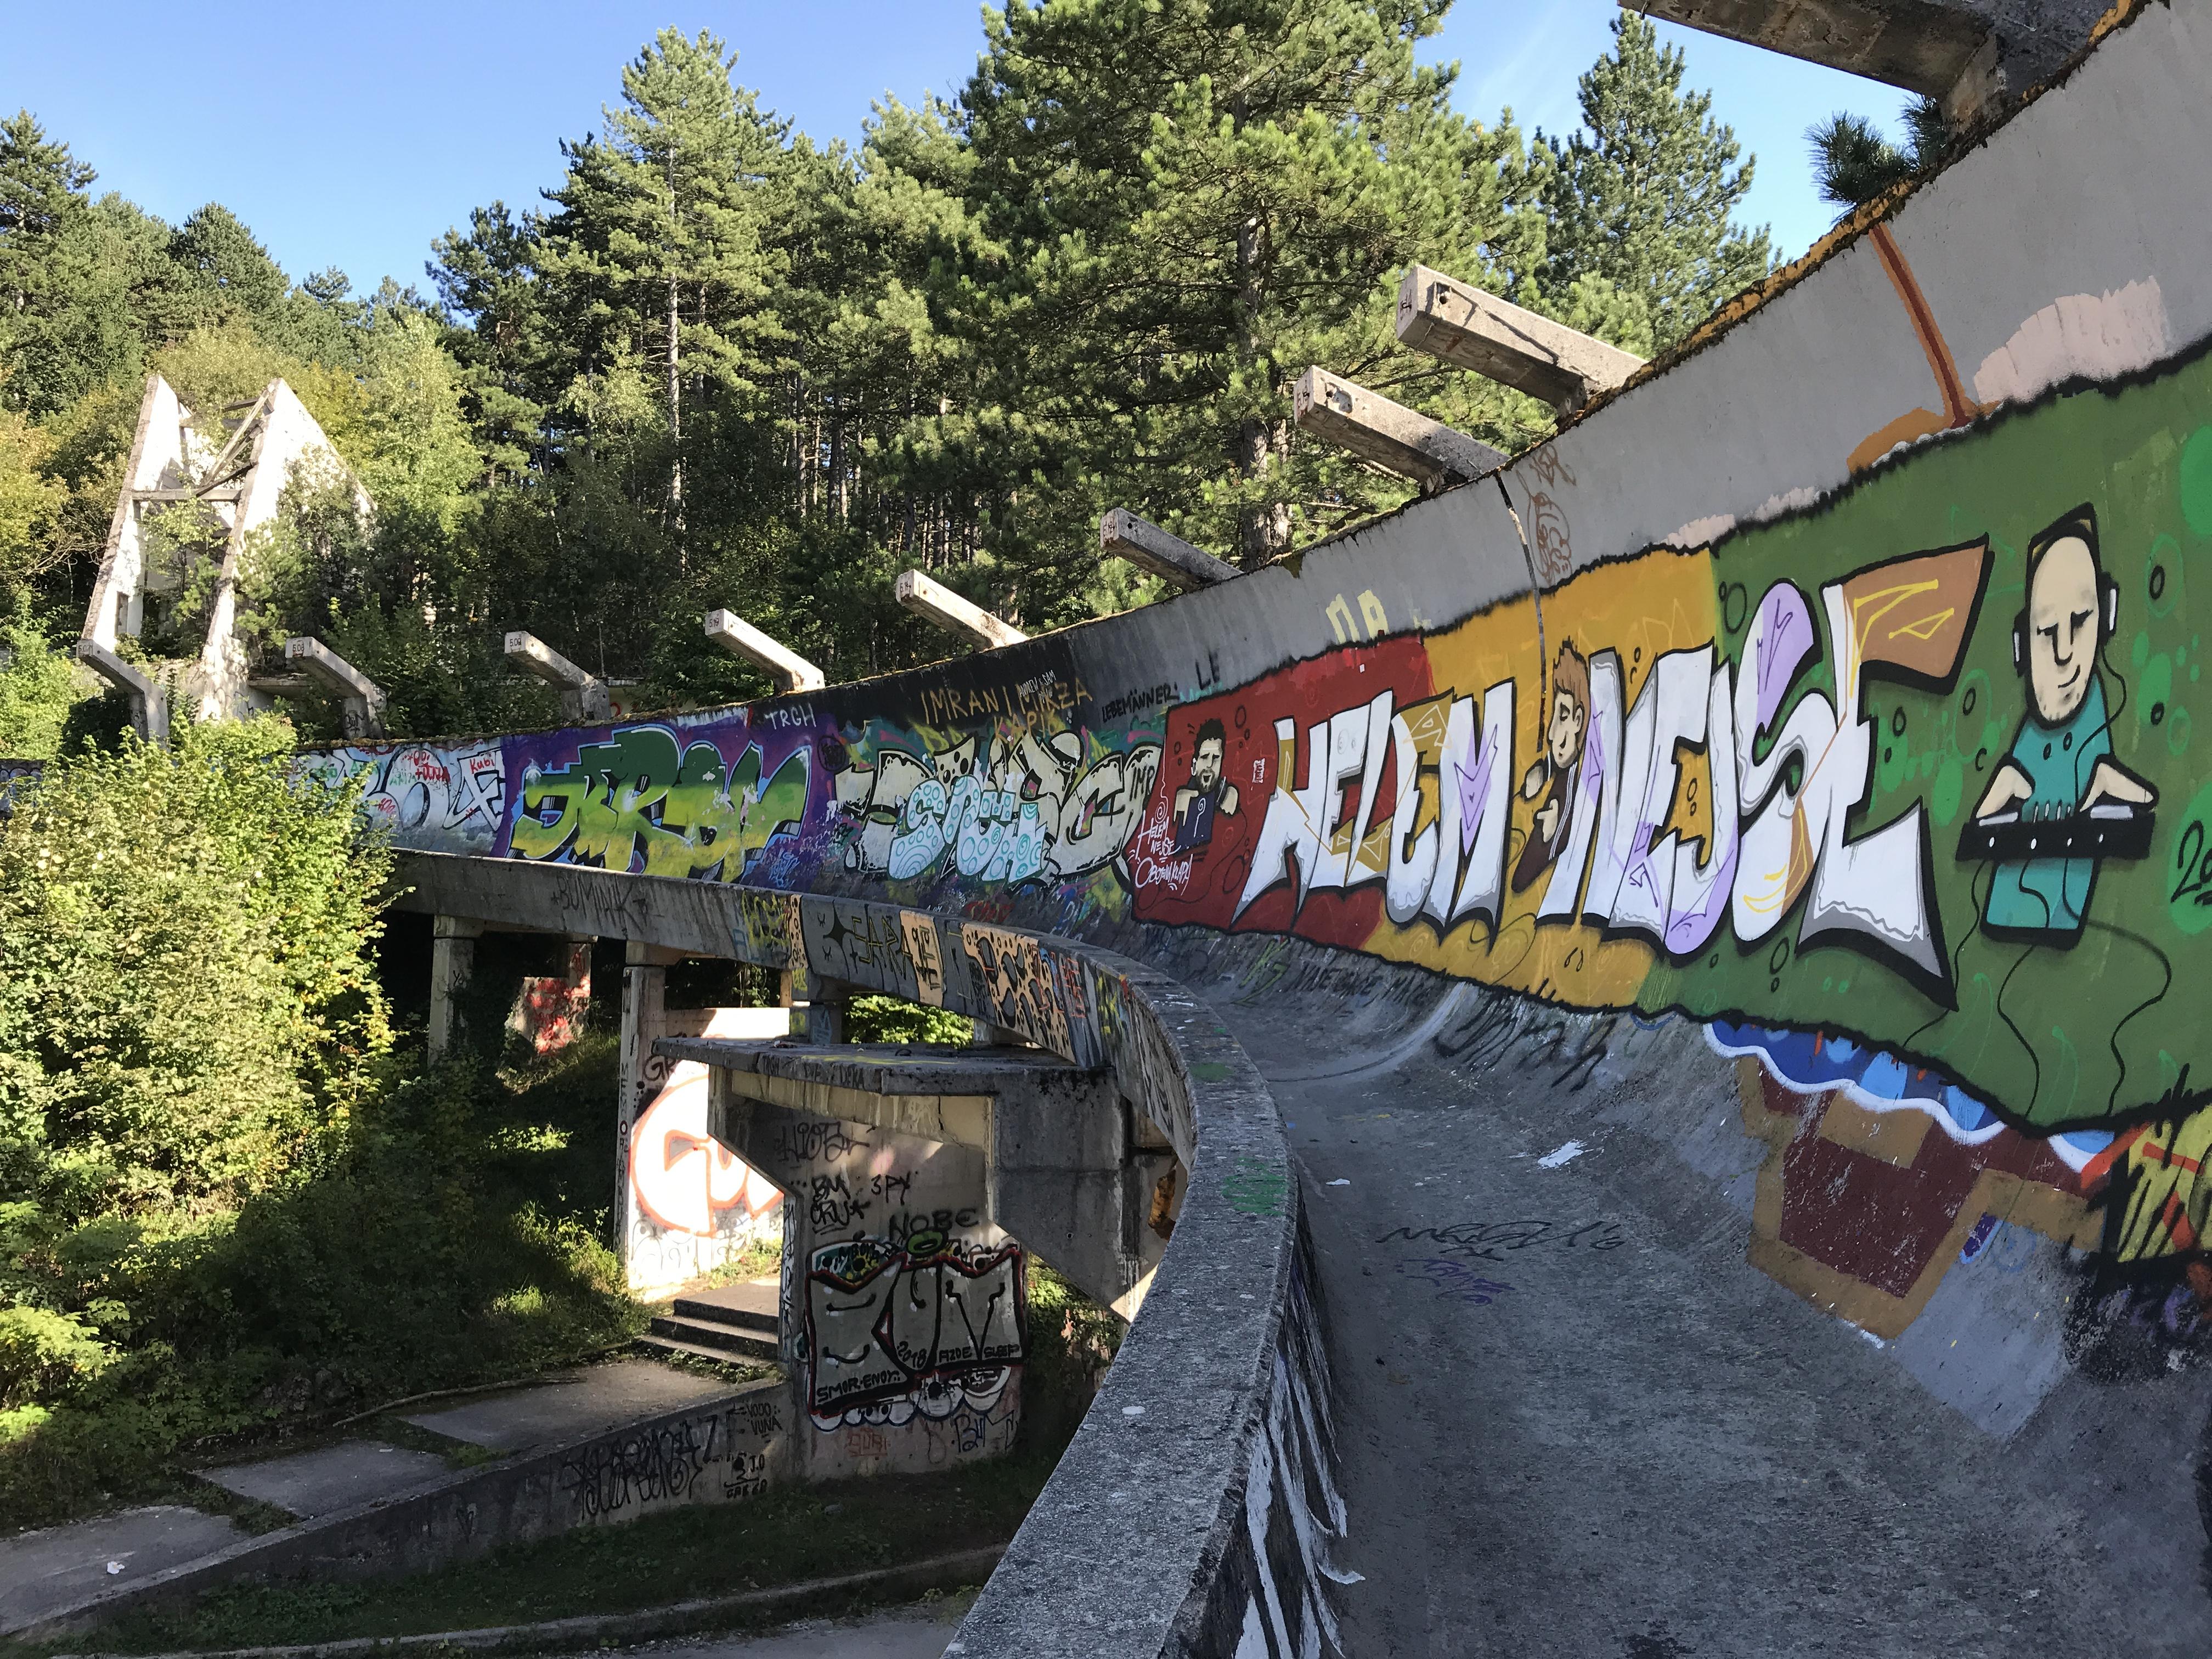 Sarajevo Bobsled Track Ruins